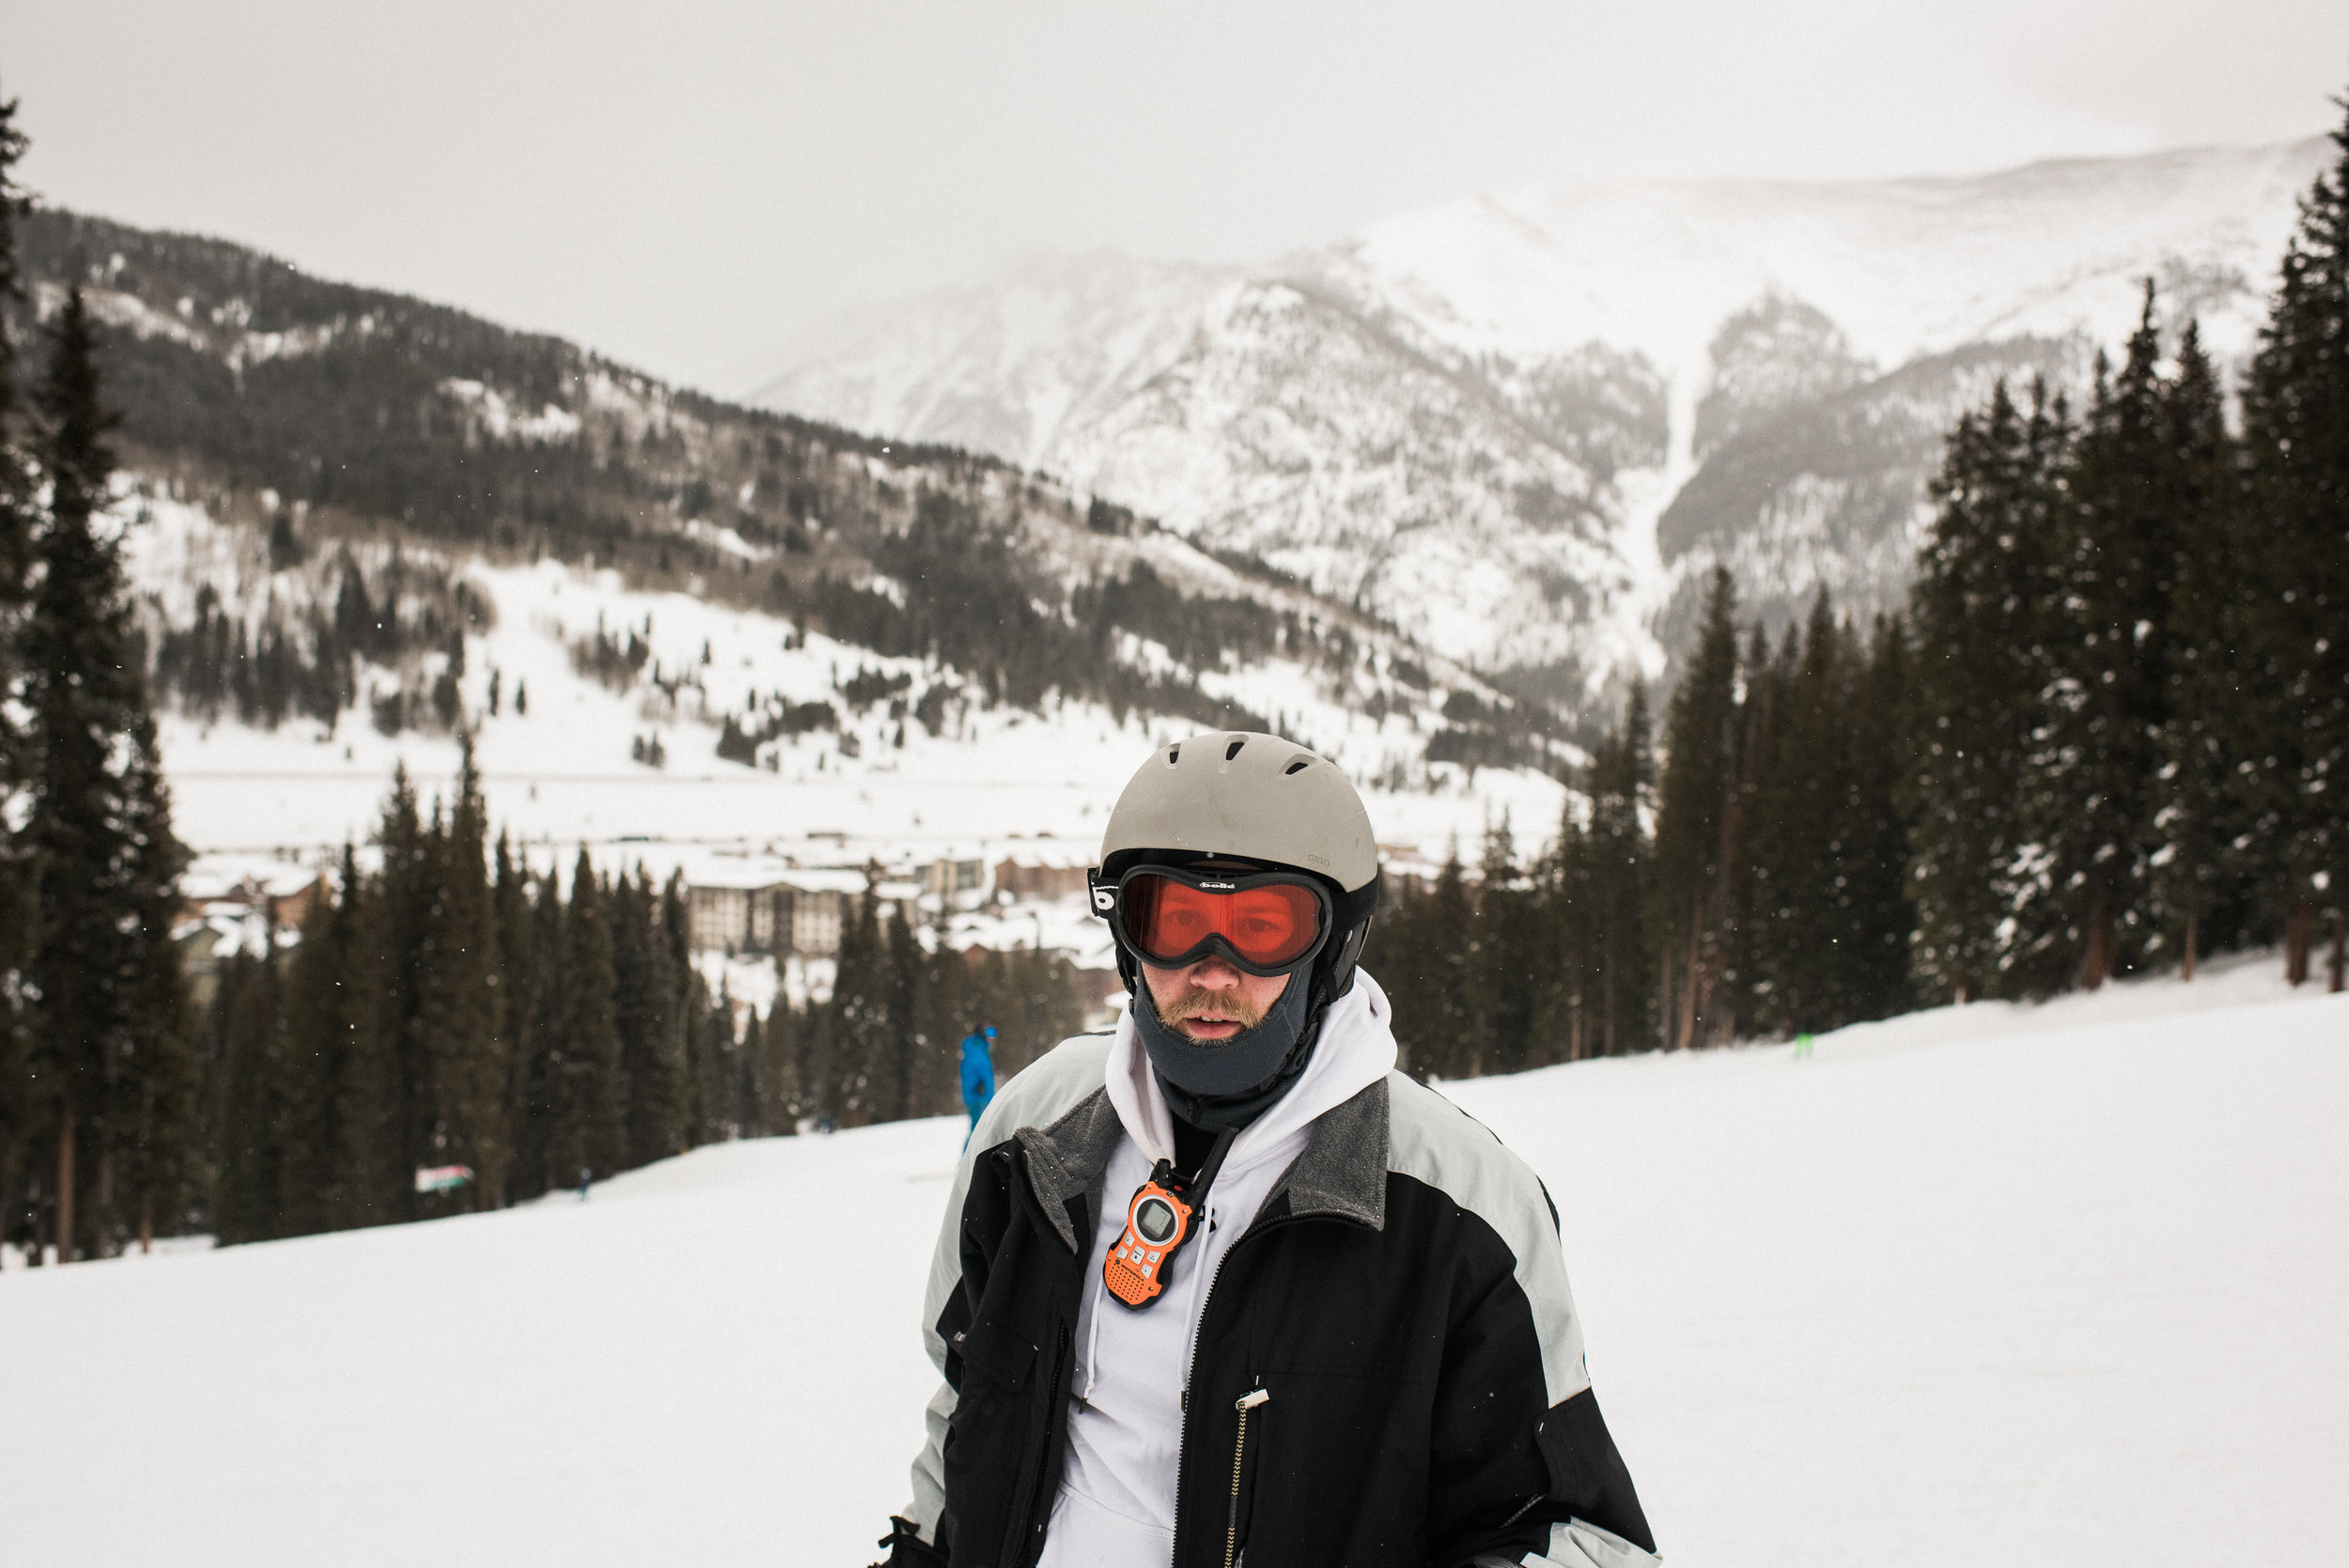 TaraShupe_Outdoor_Photographer_Loweprobags_Colorado_Copper_Mountains_Ski_17.jpg